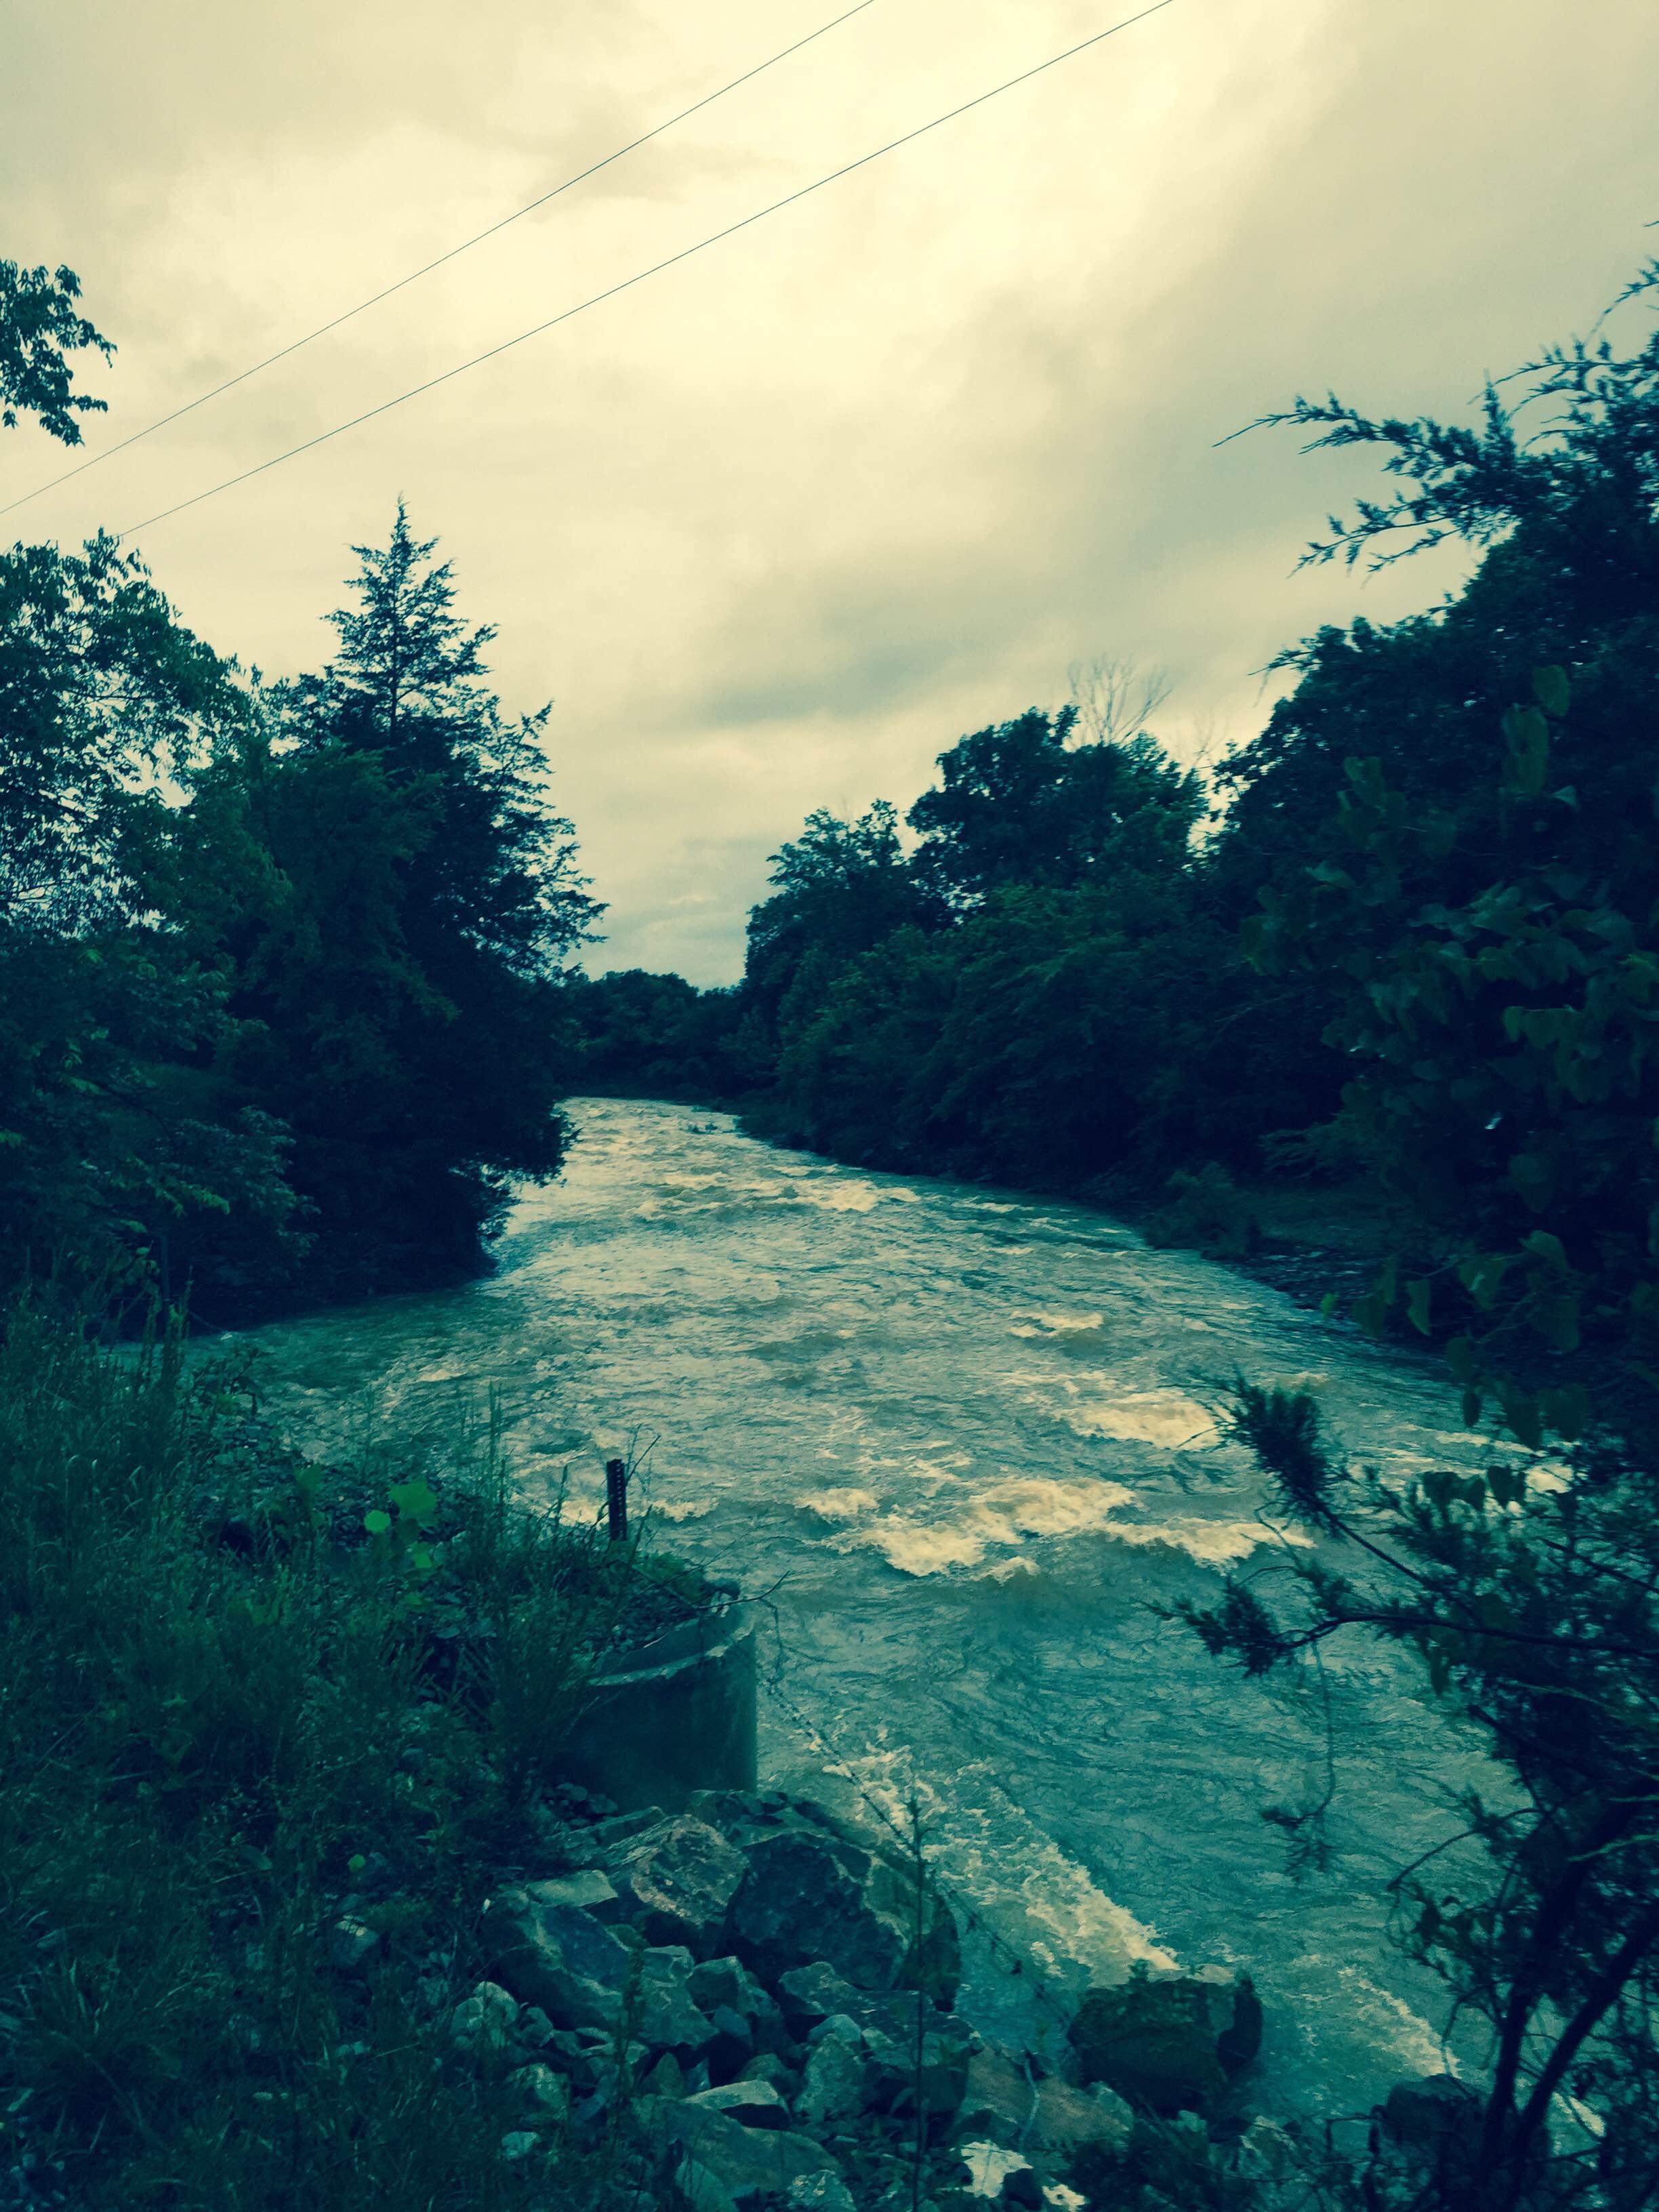 Hazel Creek from 5NEWS viewer Damon Hill